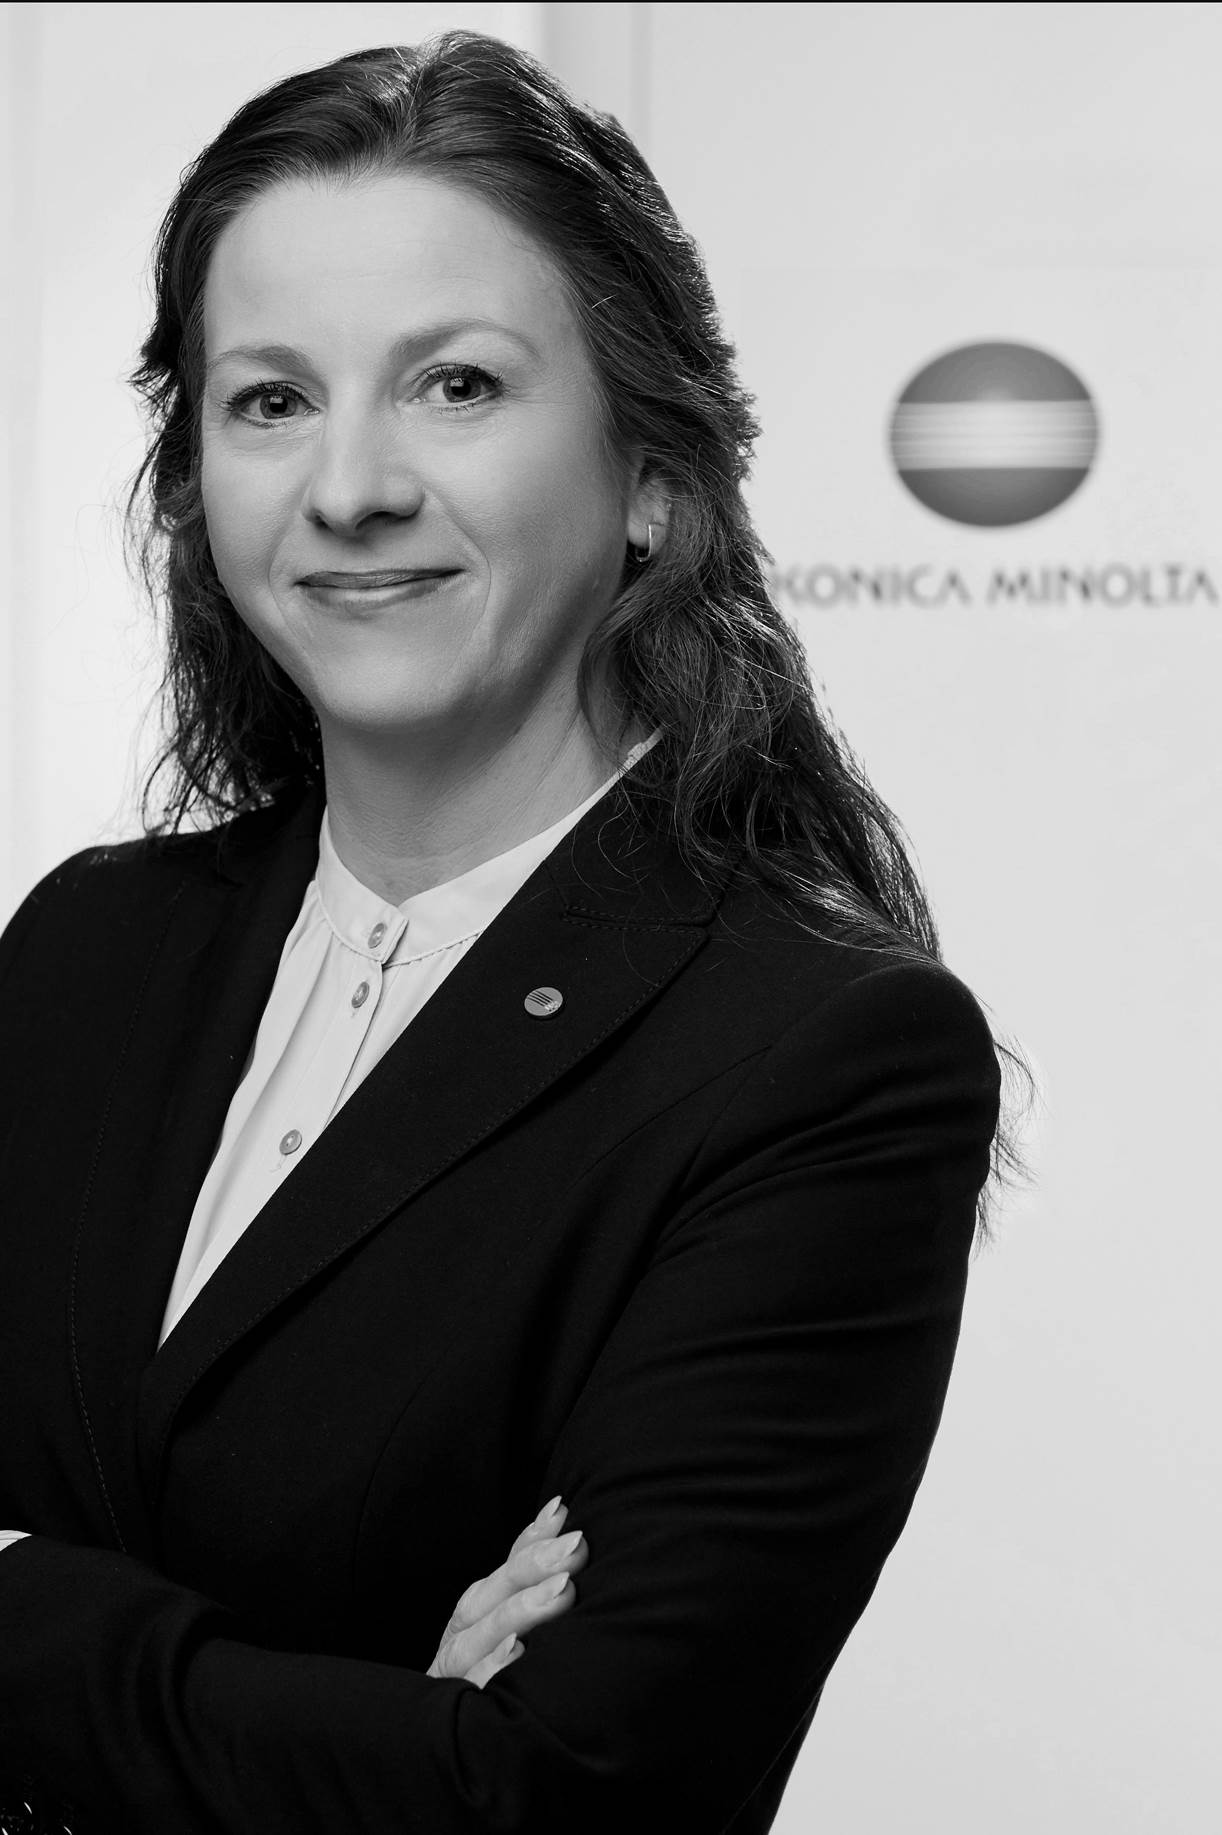 Katrin Oppermann